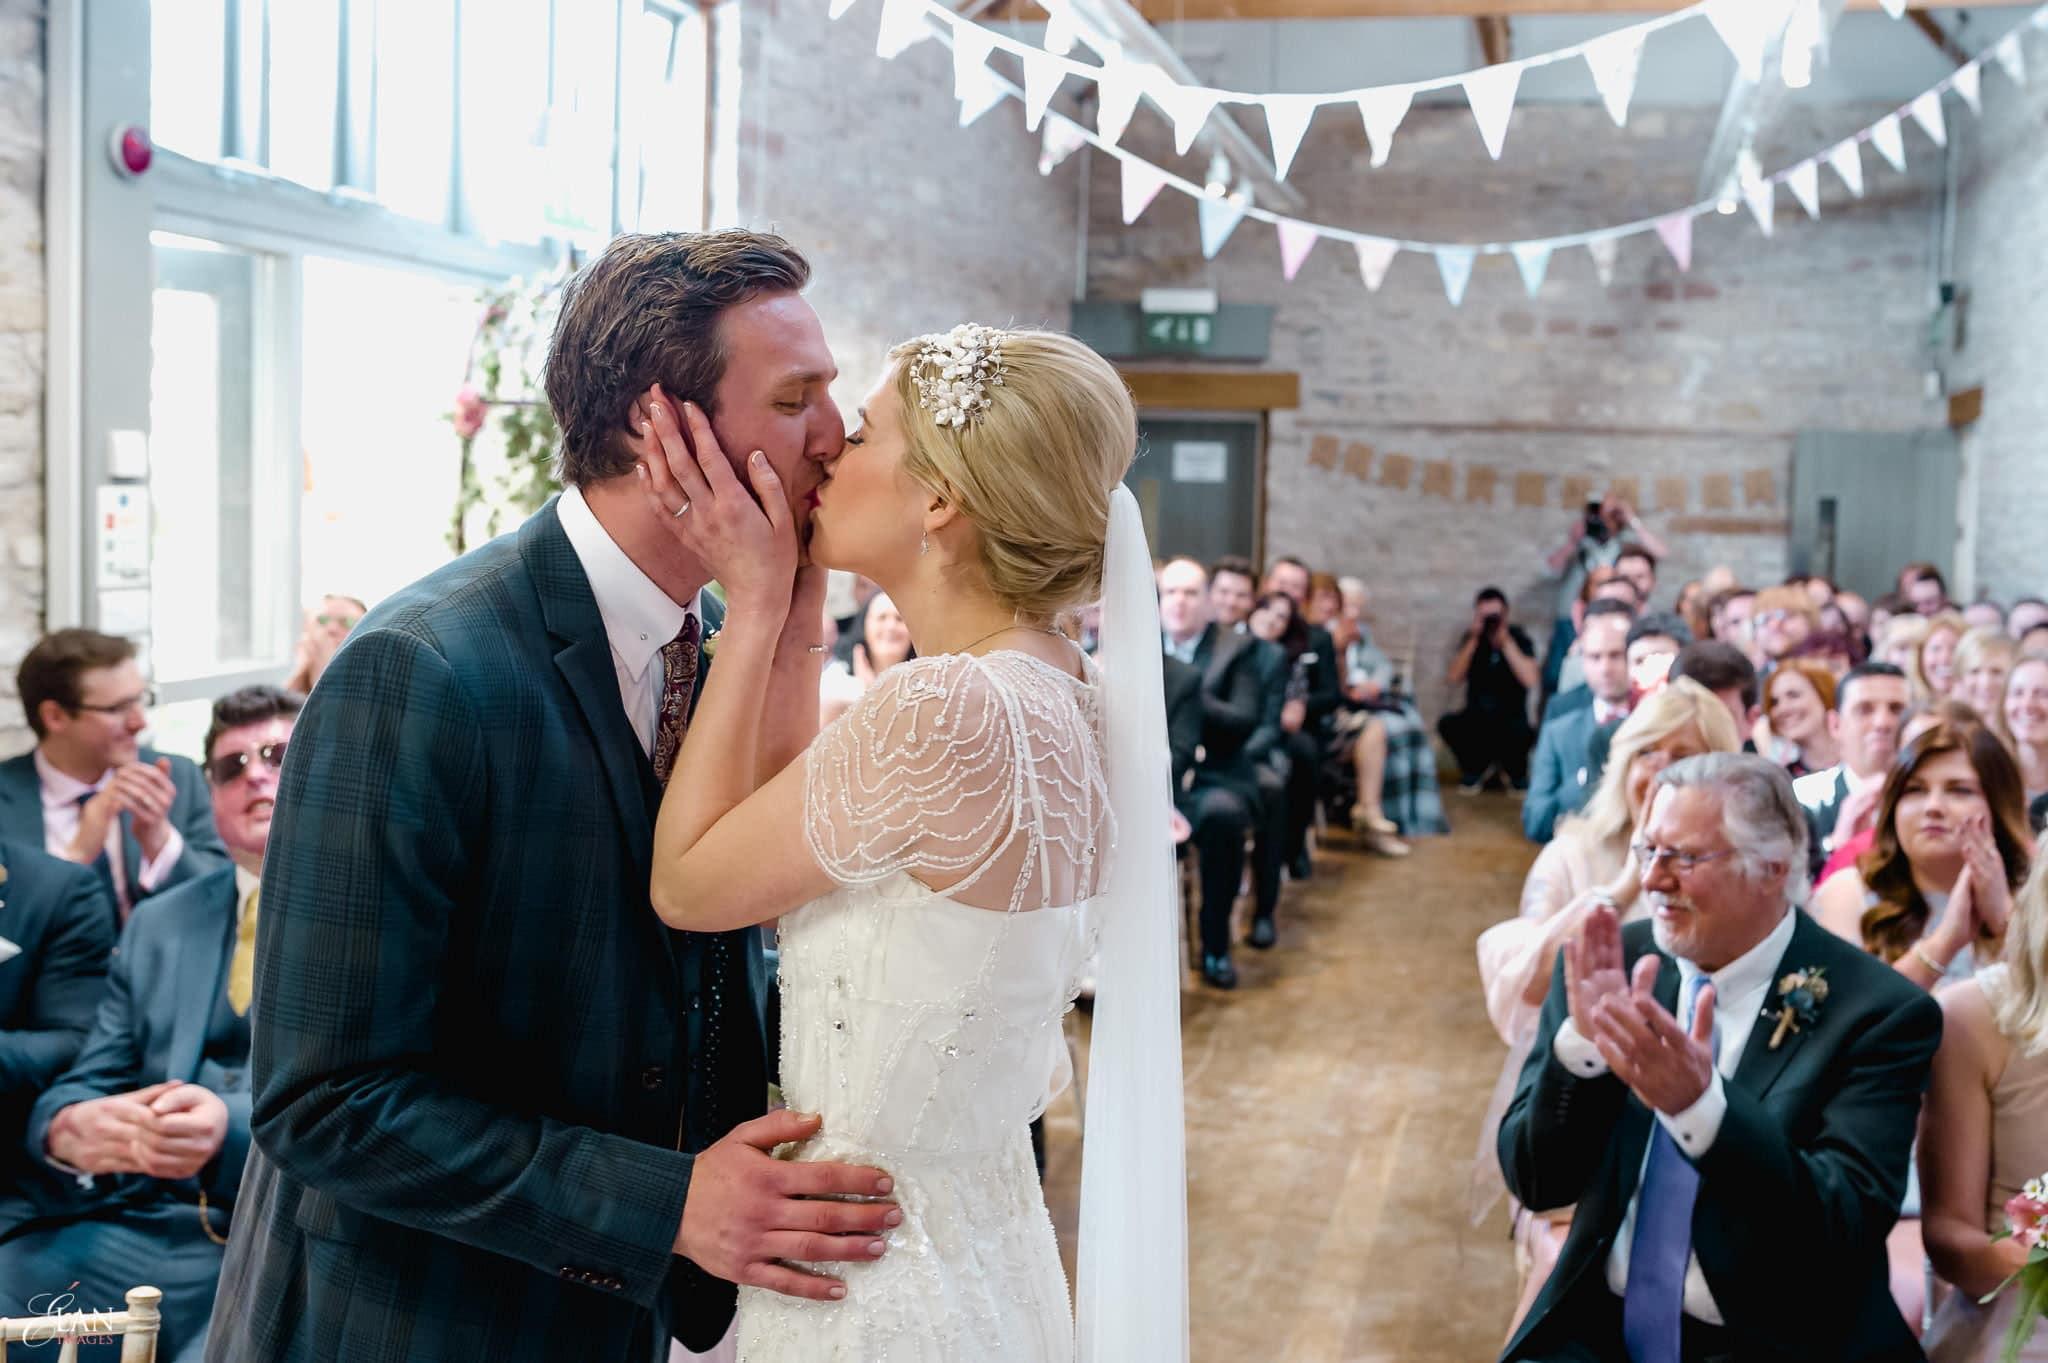 Spring Wedding at the Folly Farm Centre, Bristol 26